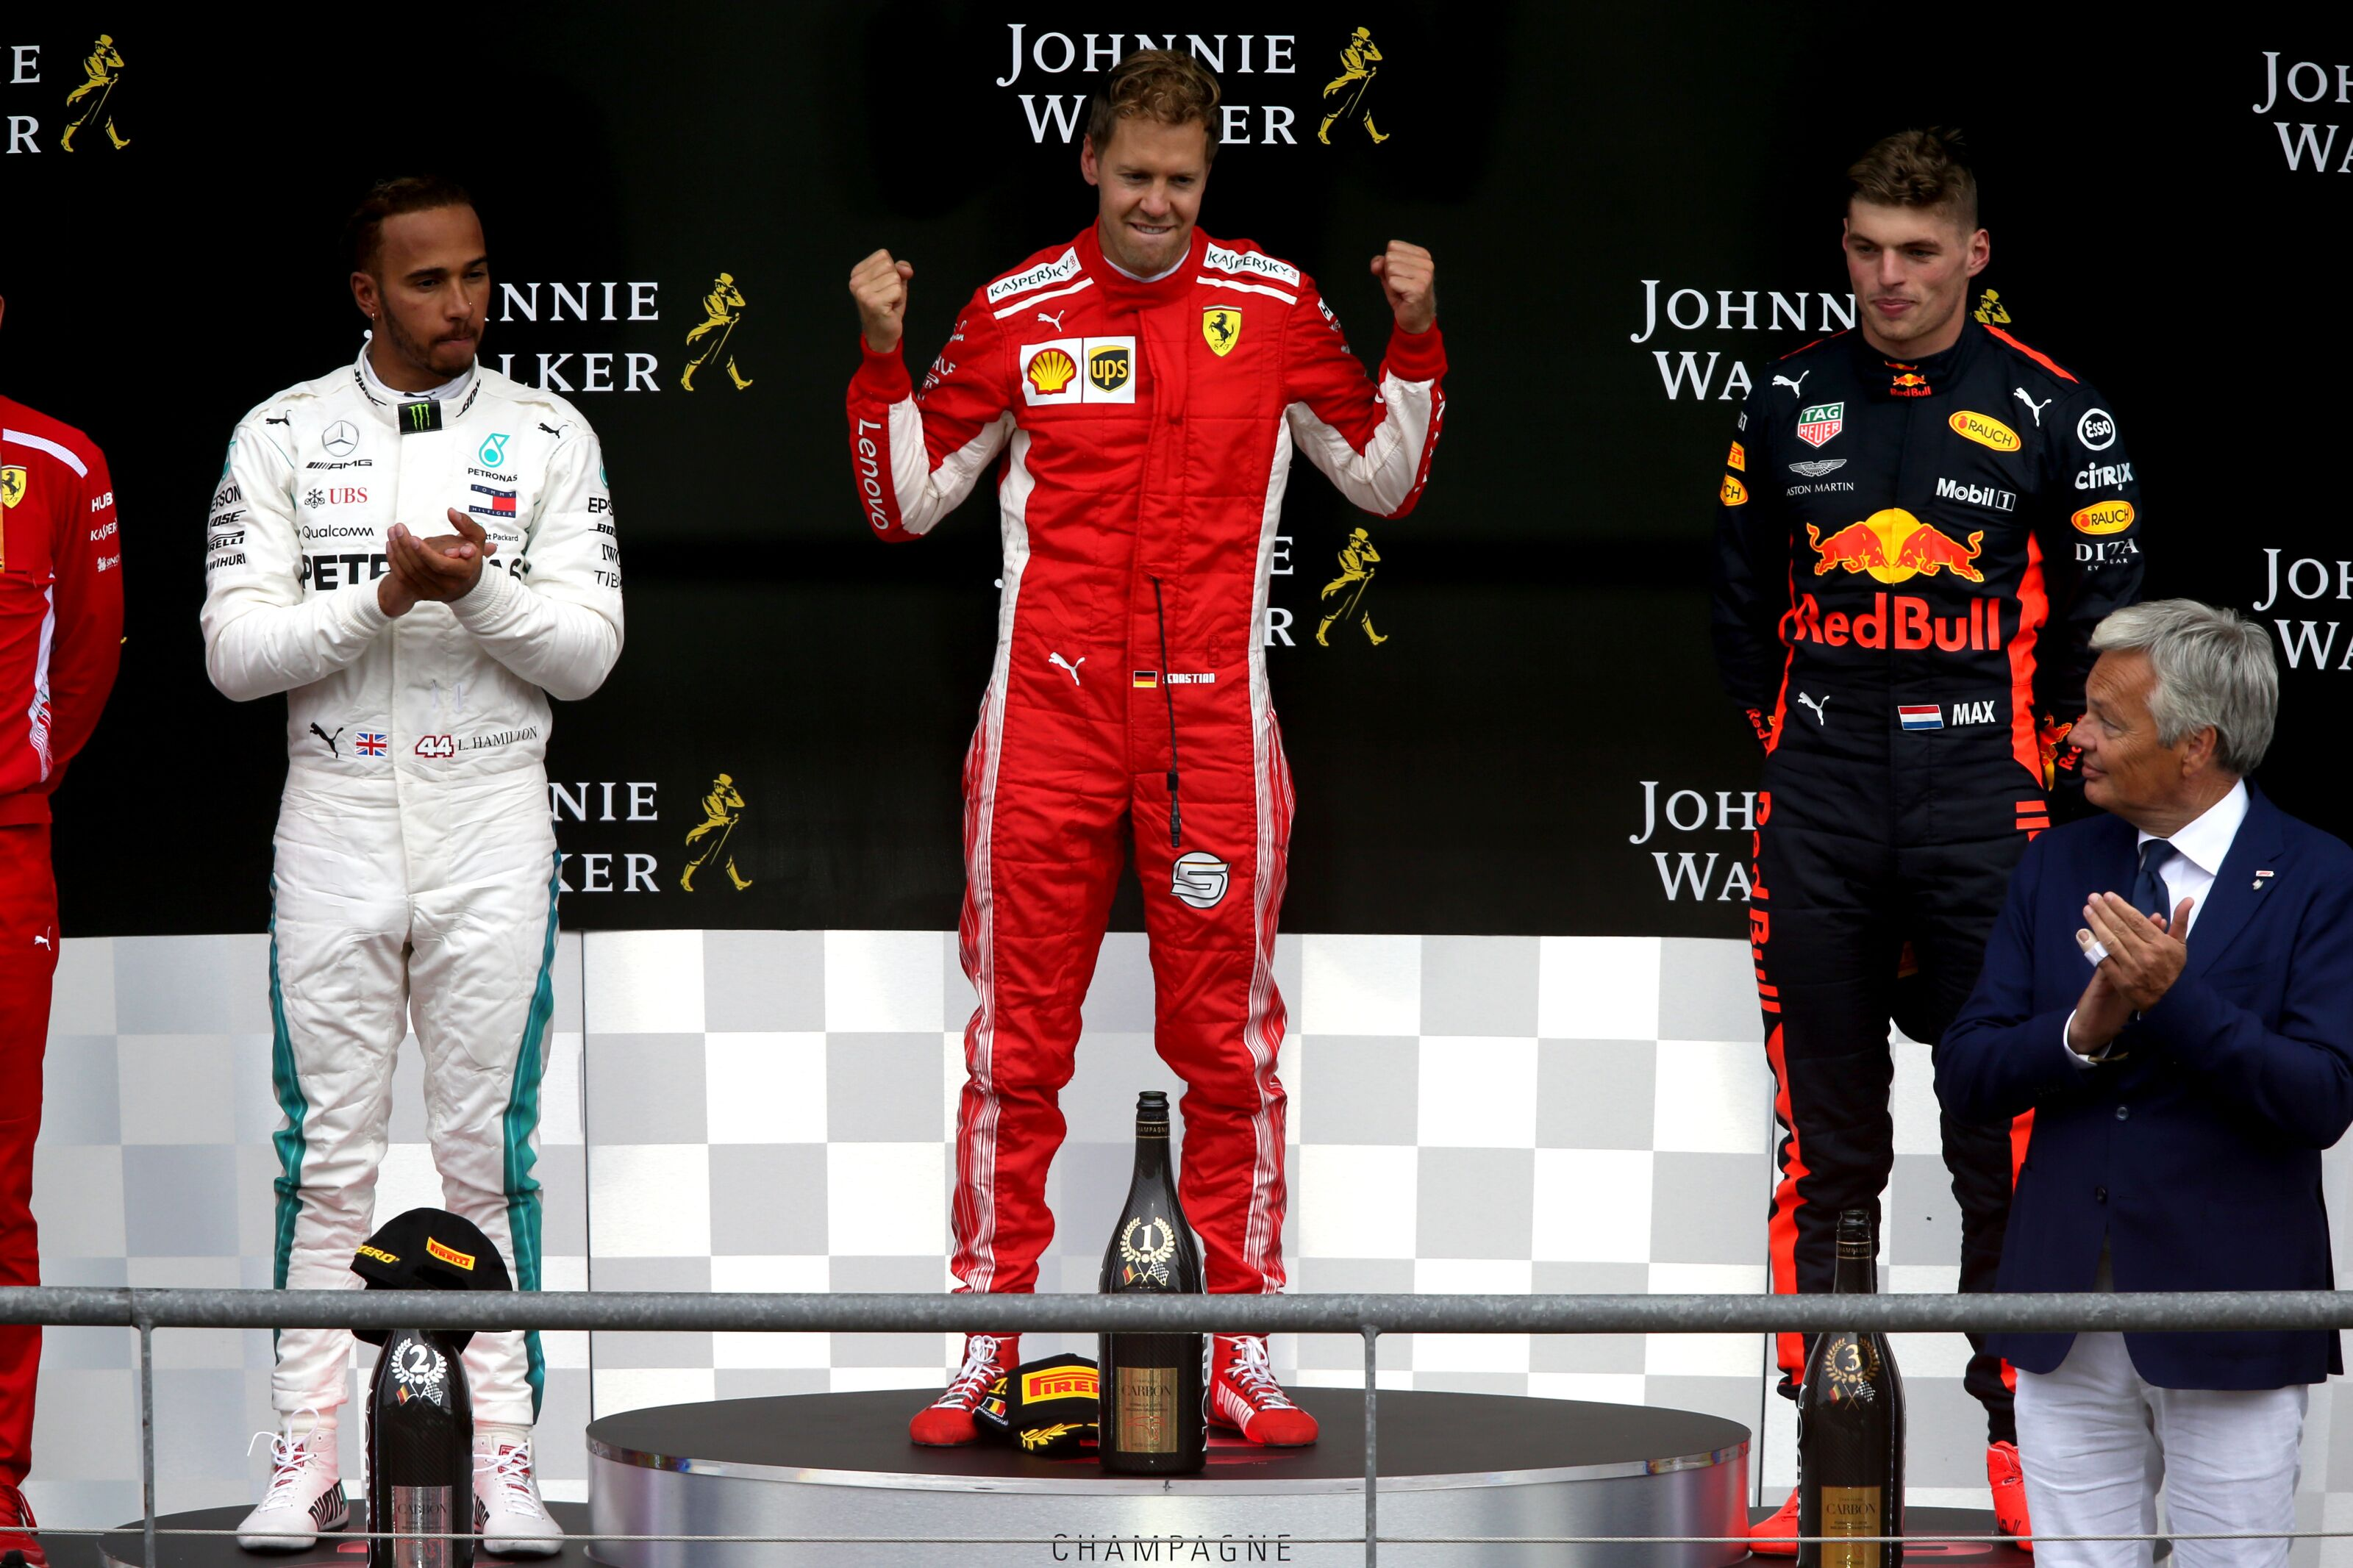 44 års racet Formula 1: Post race driver grades after the 2018 Belgian Grand Prix 44 års racet